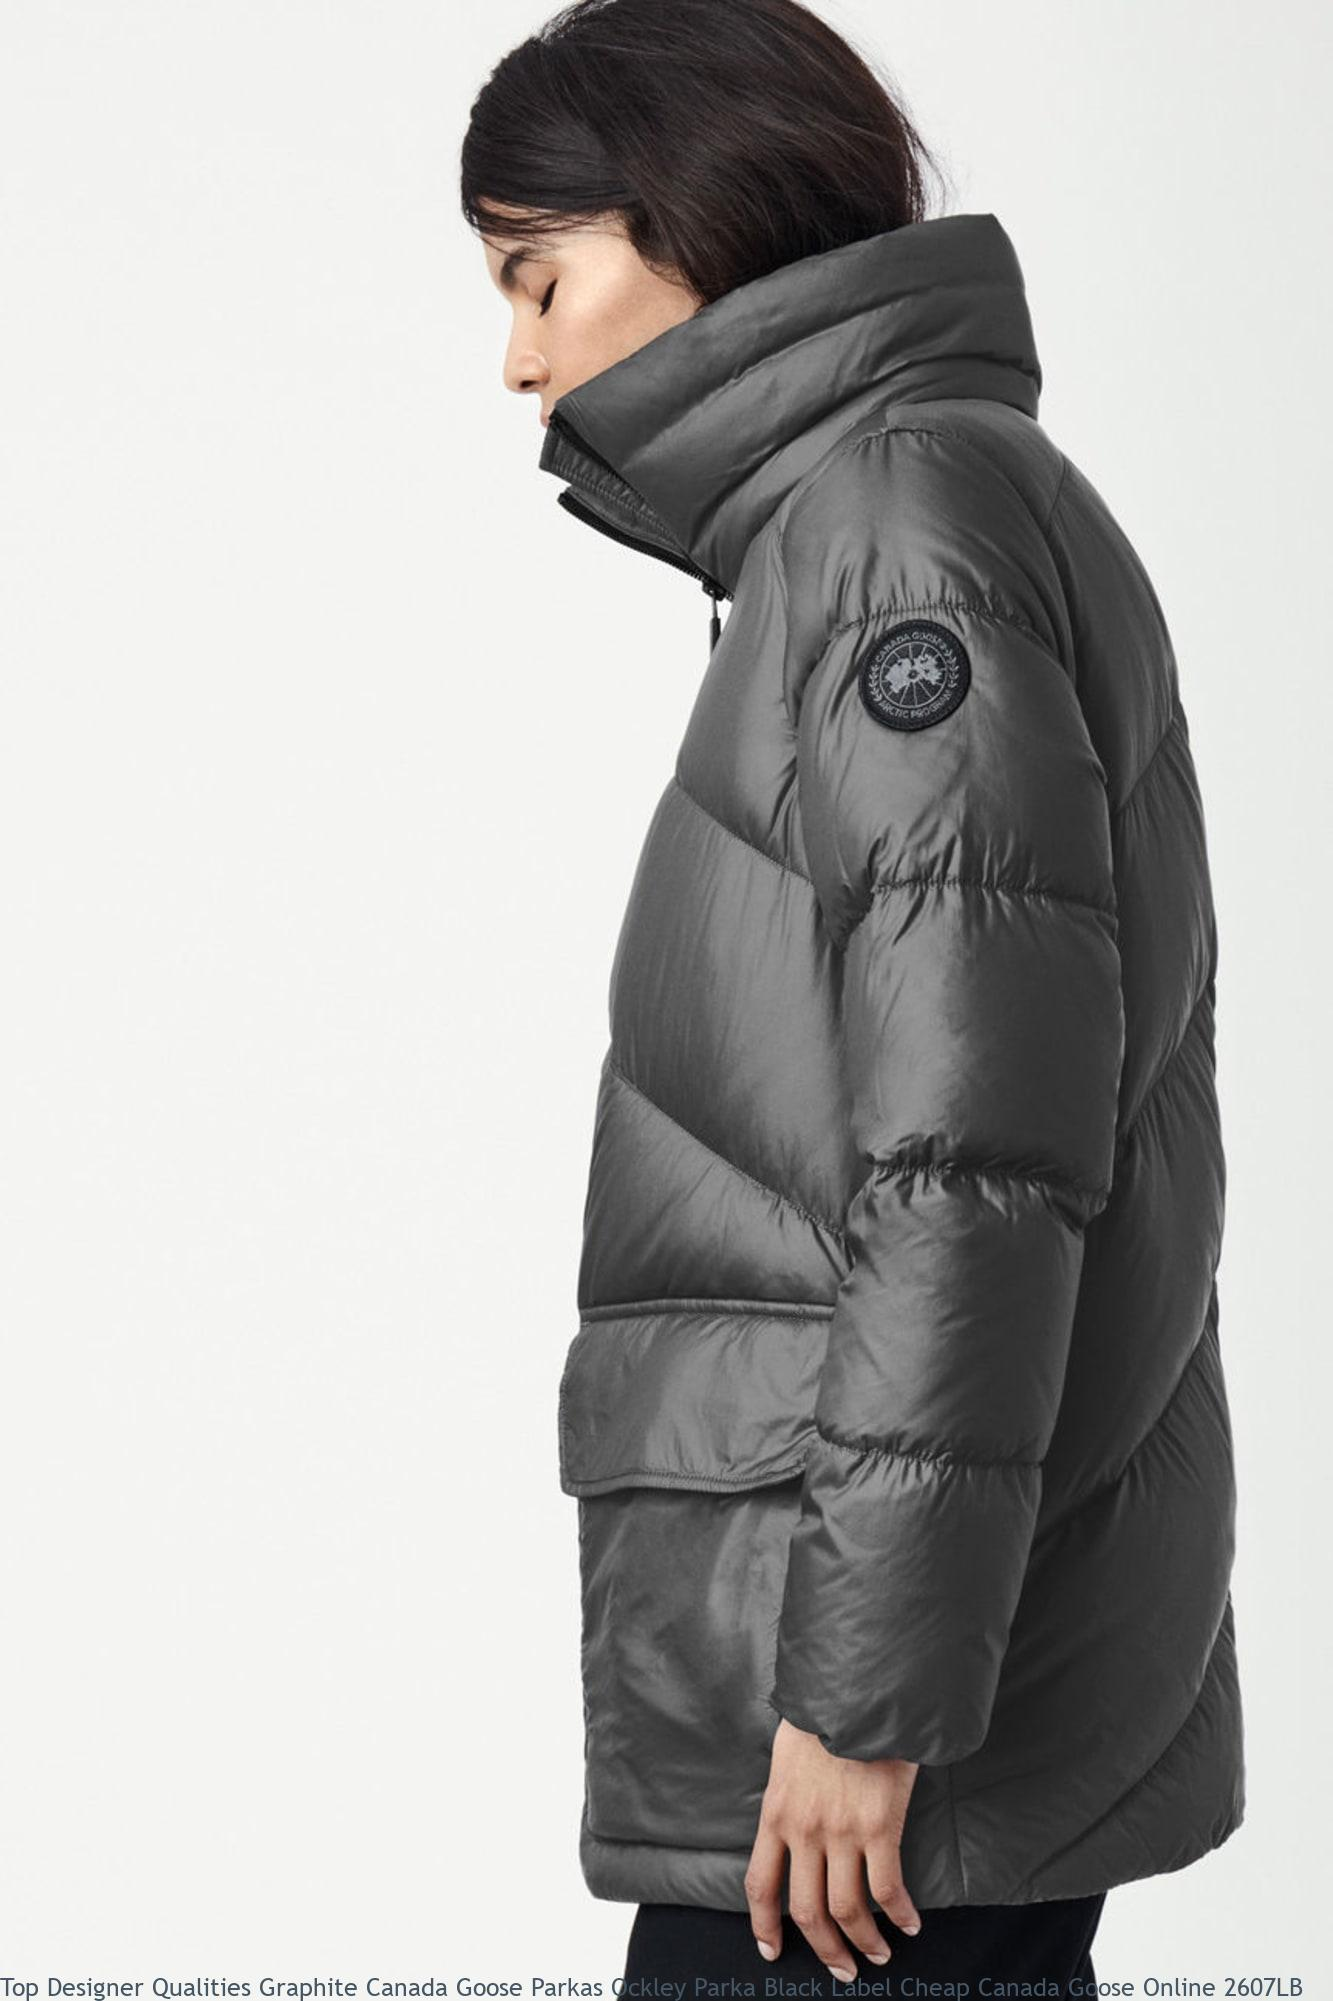 Top Designer Qualities Graphite Canada Goose Parkas Ockley Parka Black Label Cheap Canada Goose Online 2607LB